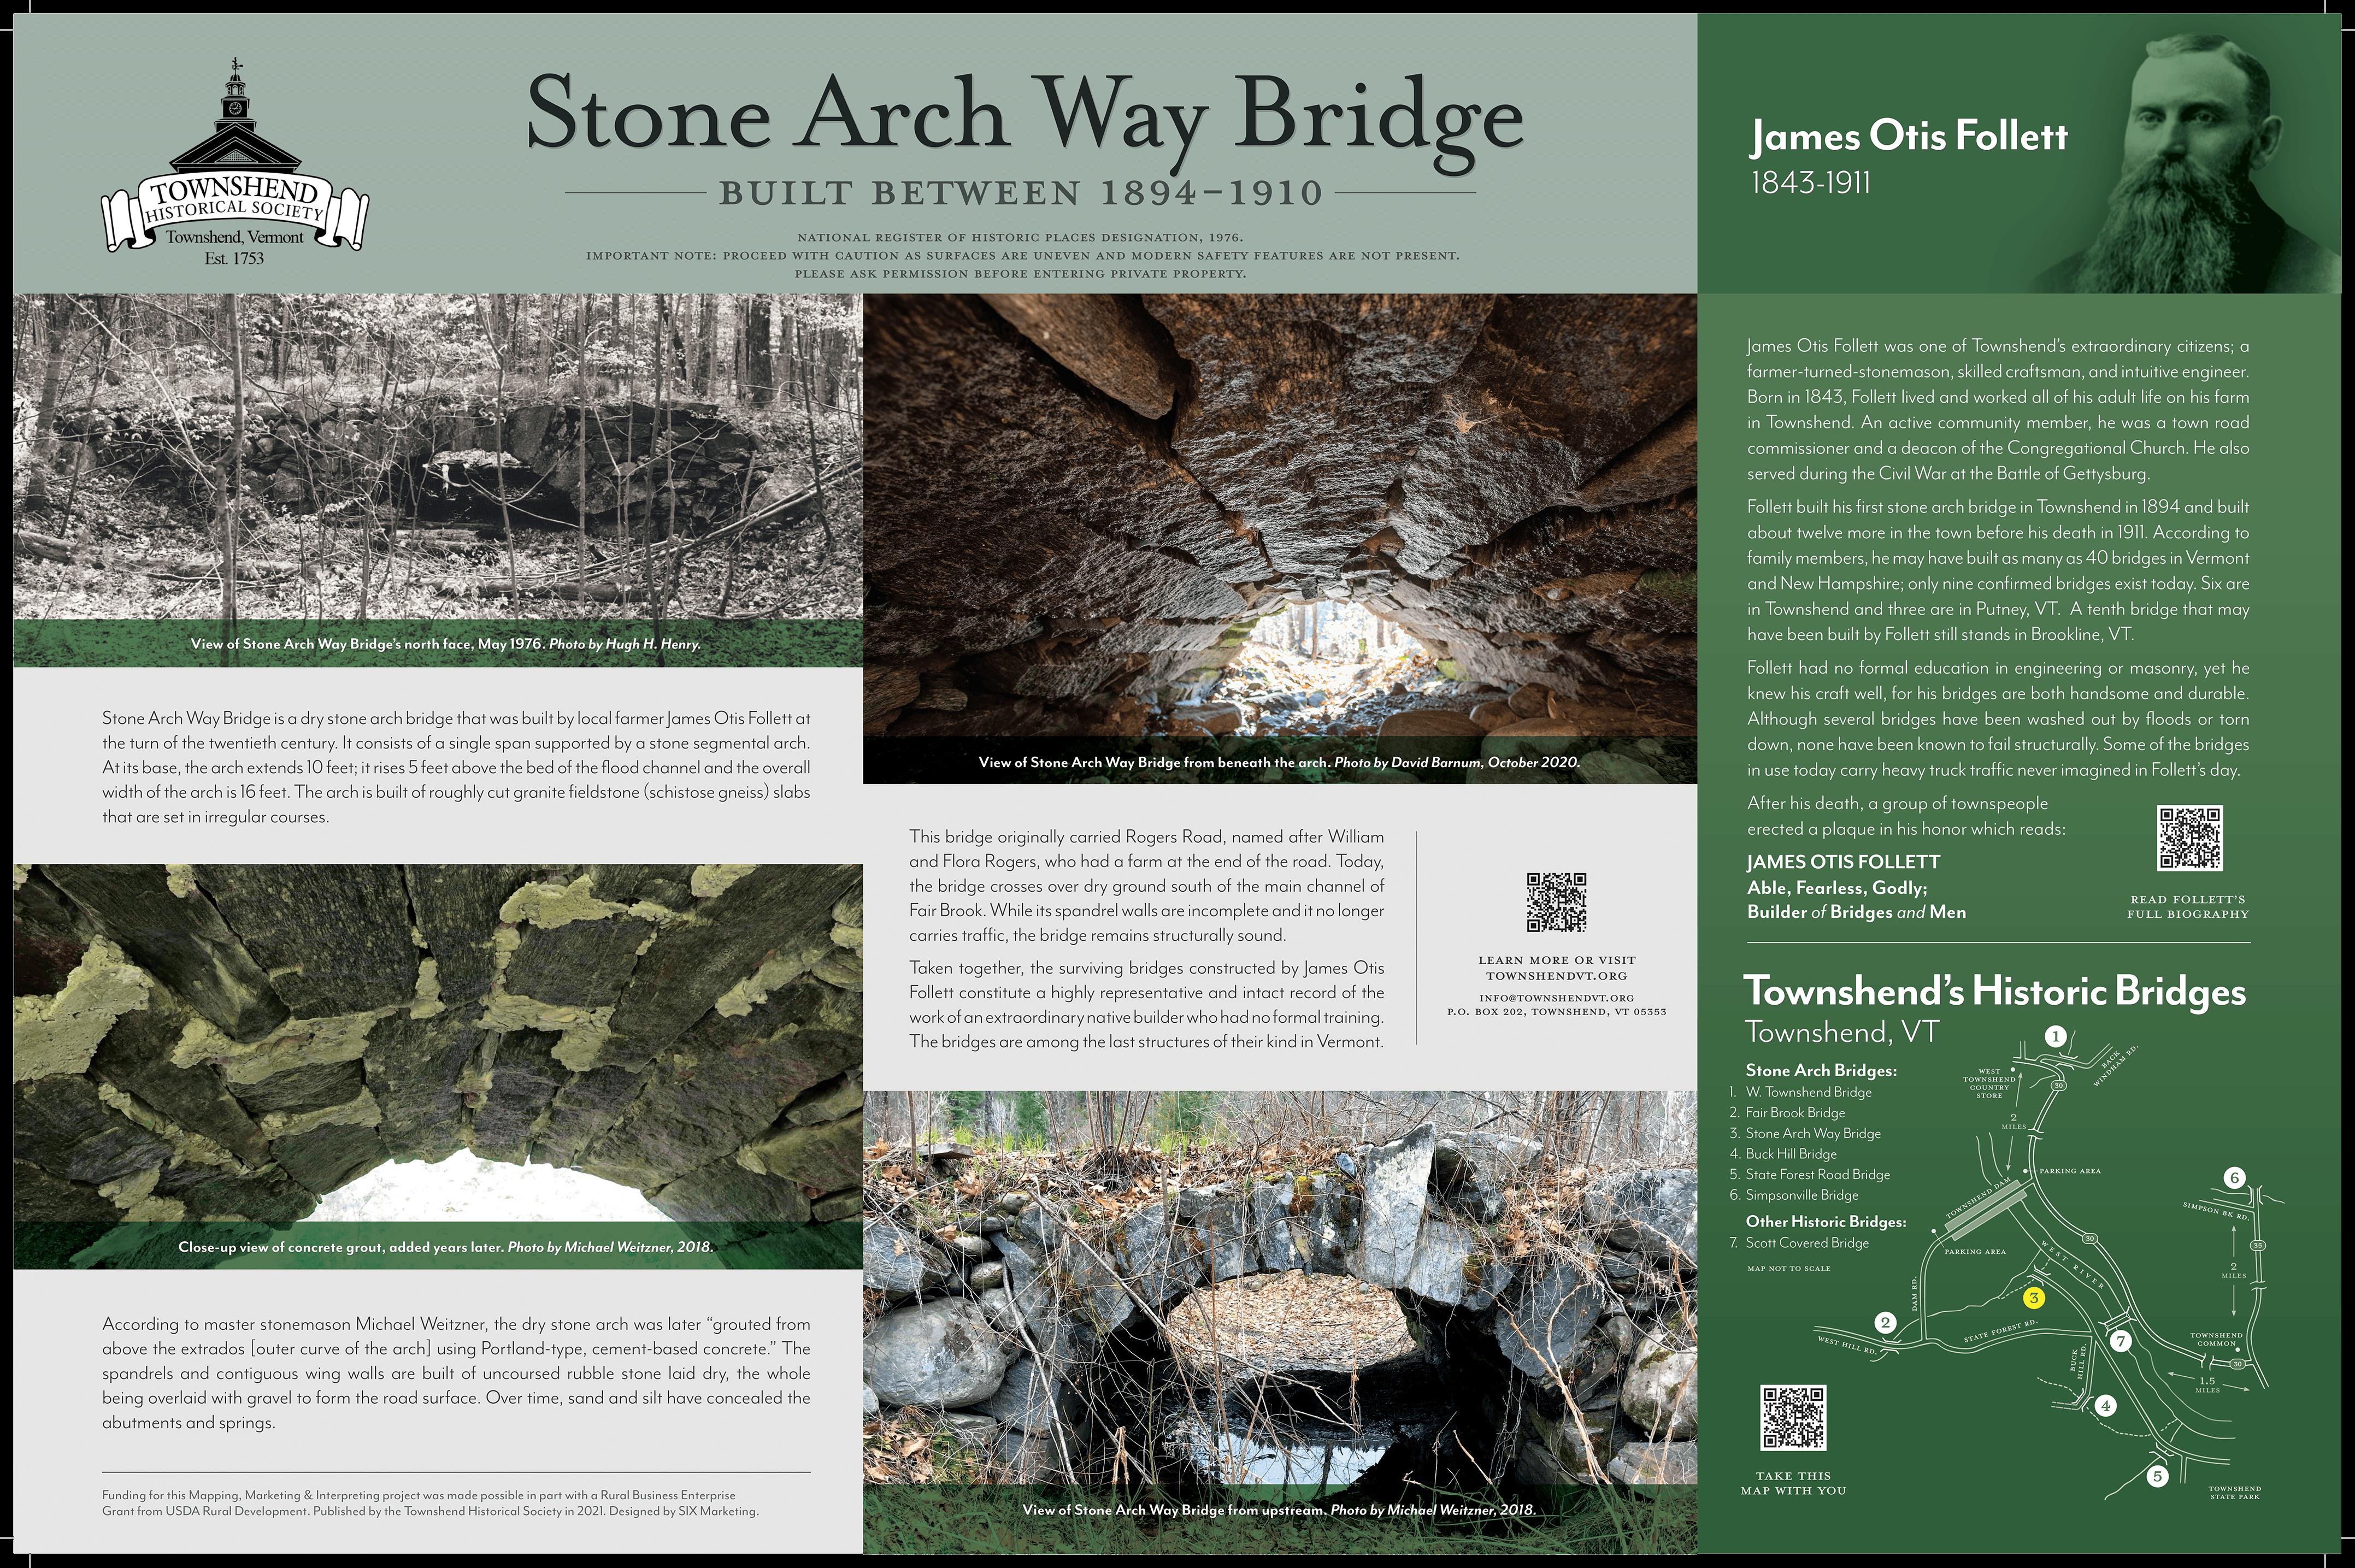 stone arch way bridge